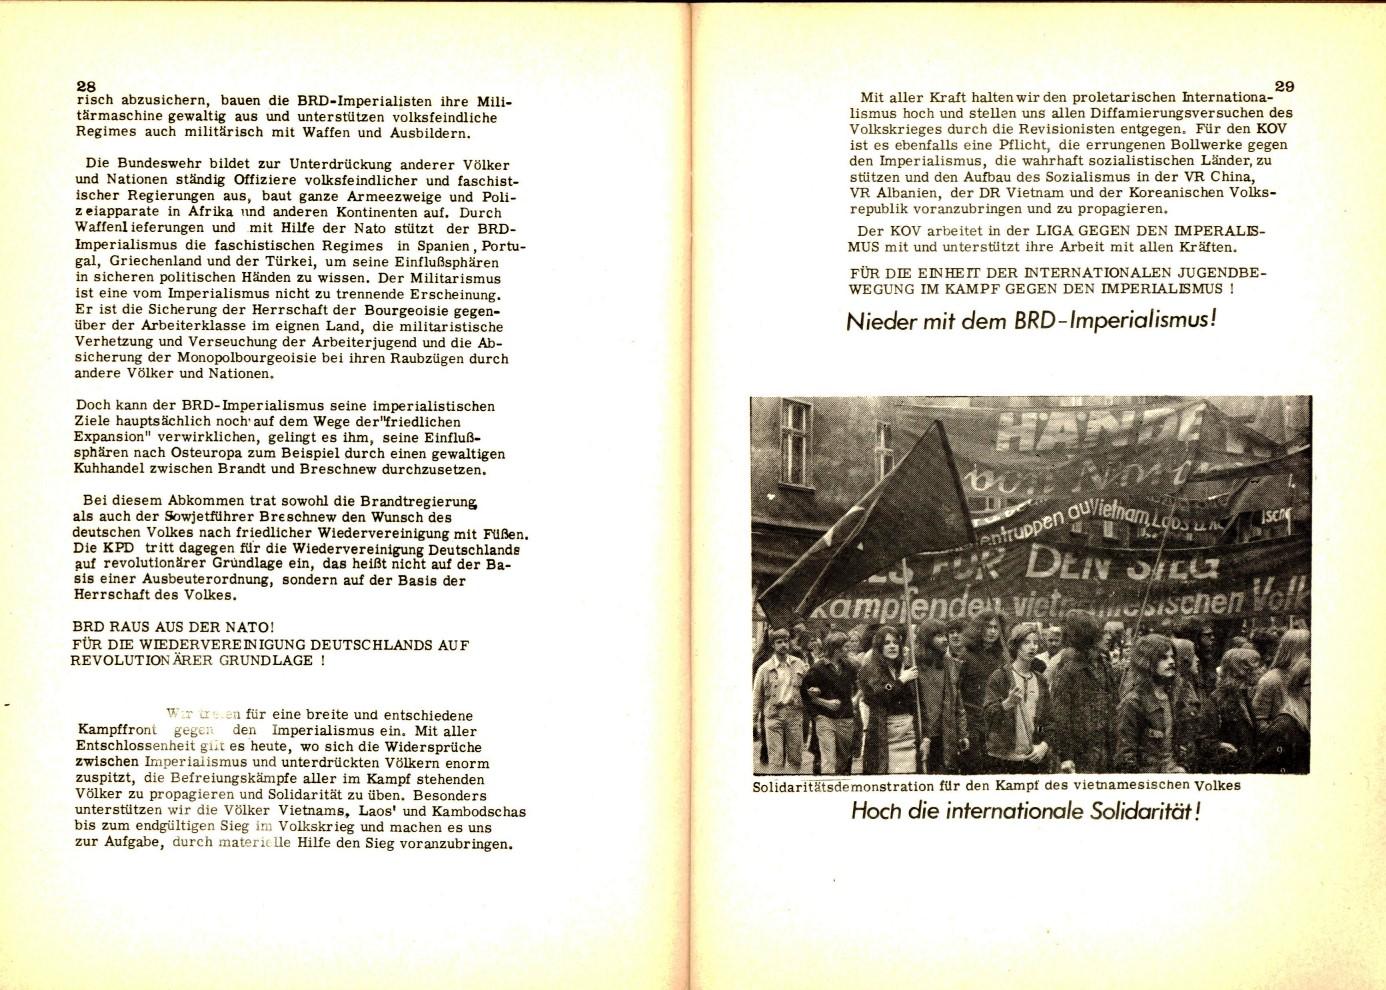 KOV_1973_Aktionsprogramm_17